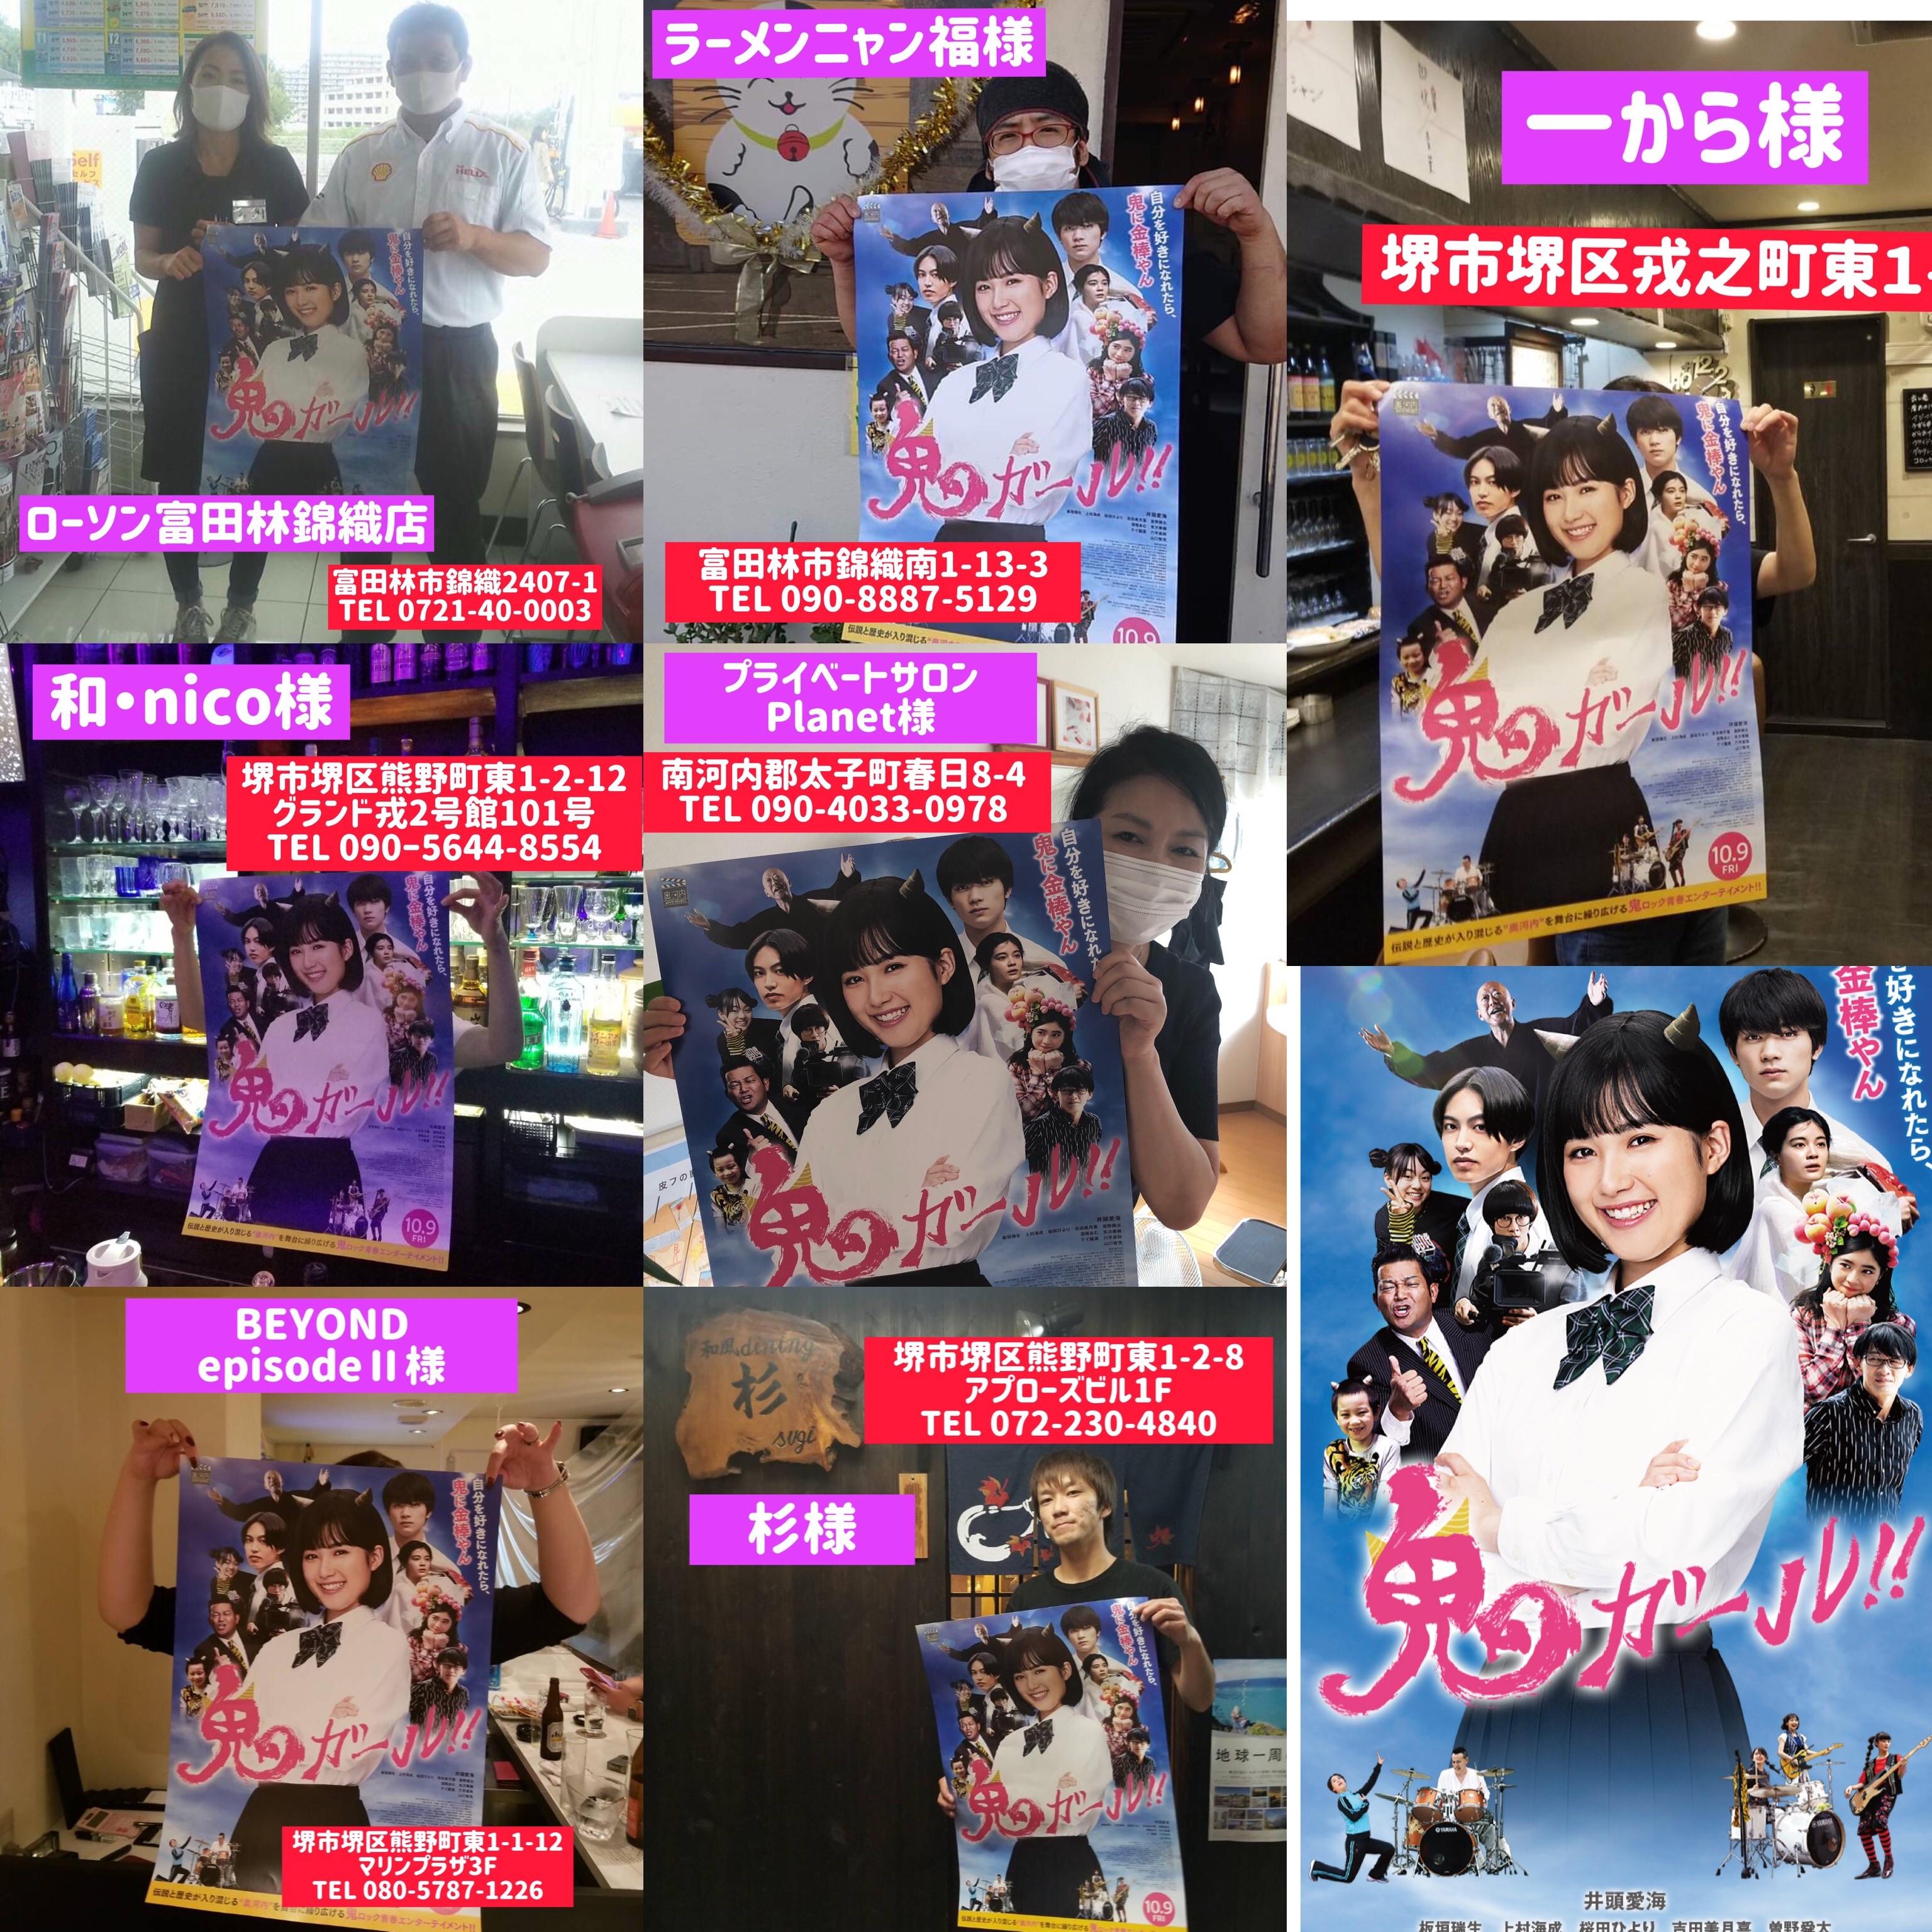 f:id:carp_0301_kenta:20201002174835j:image